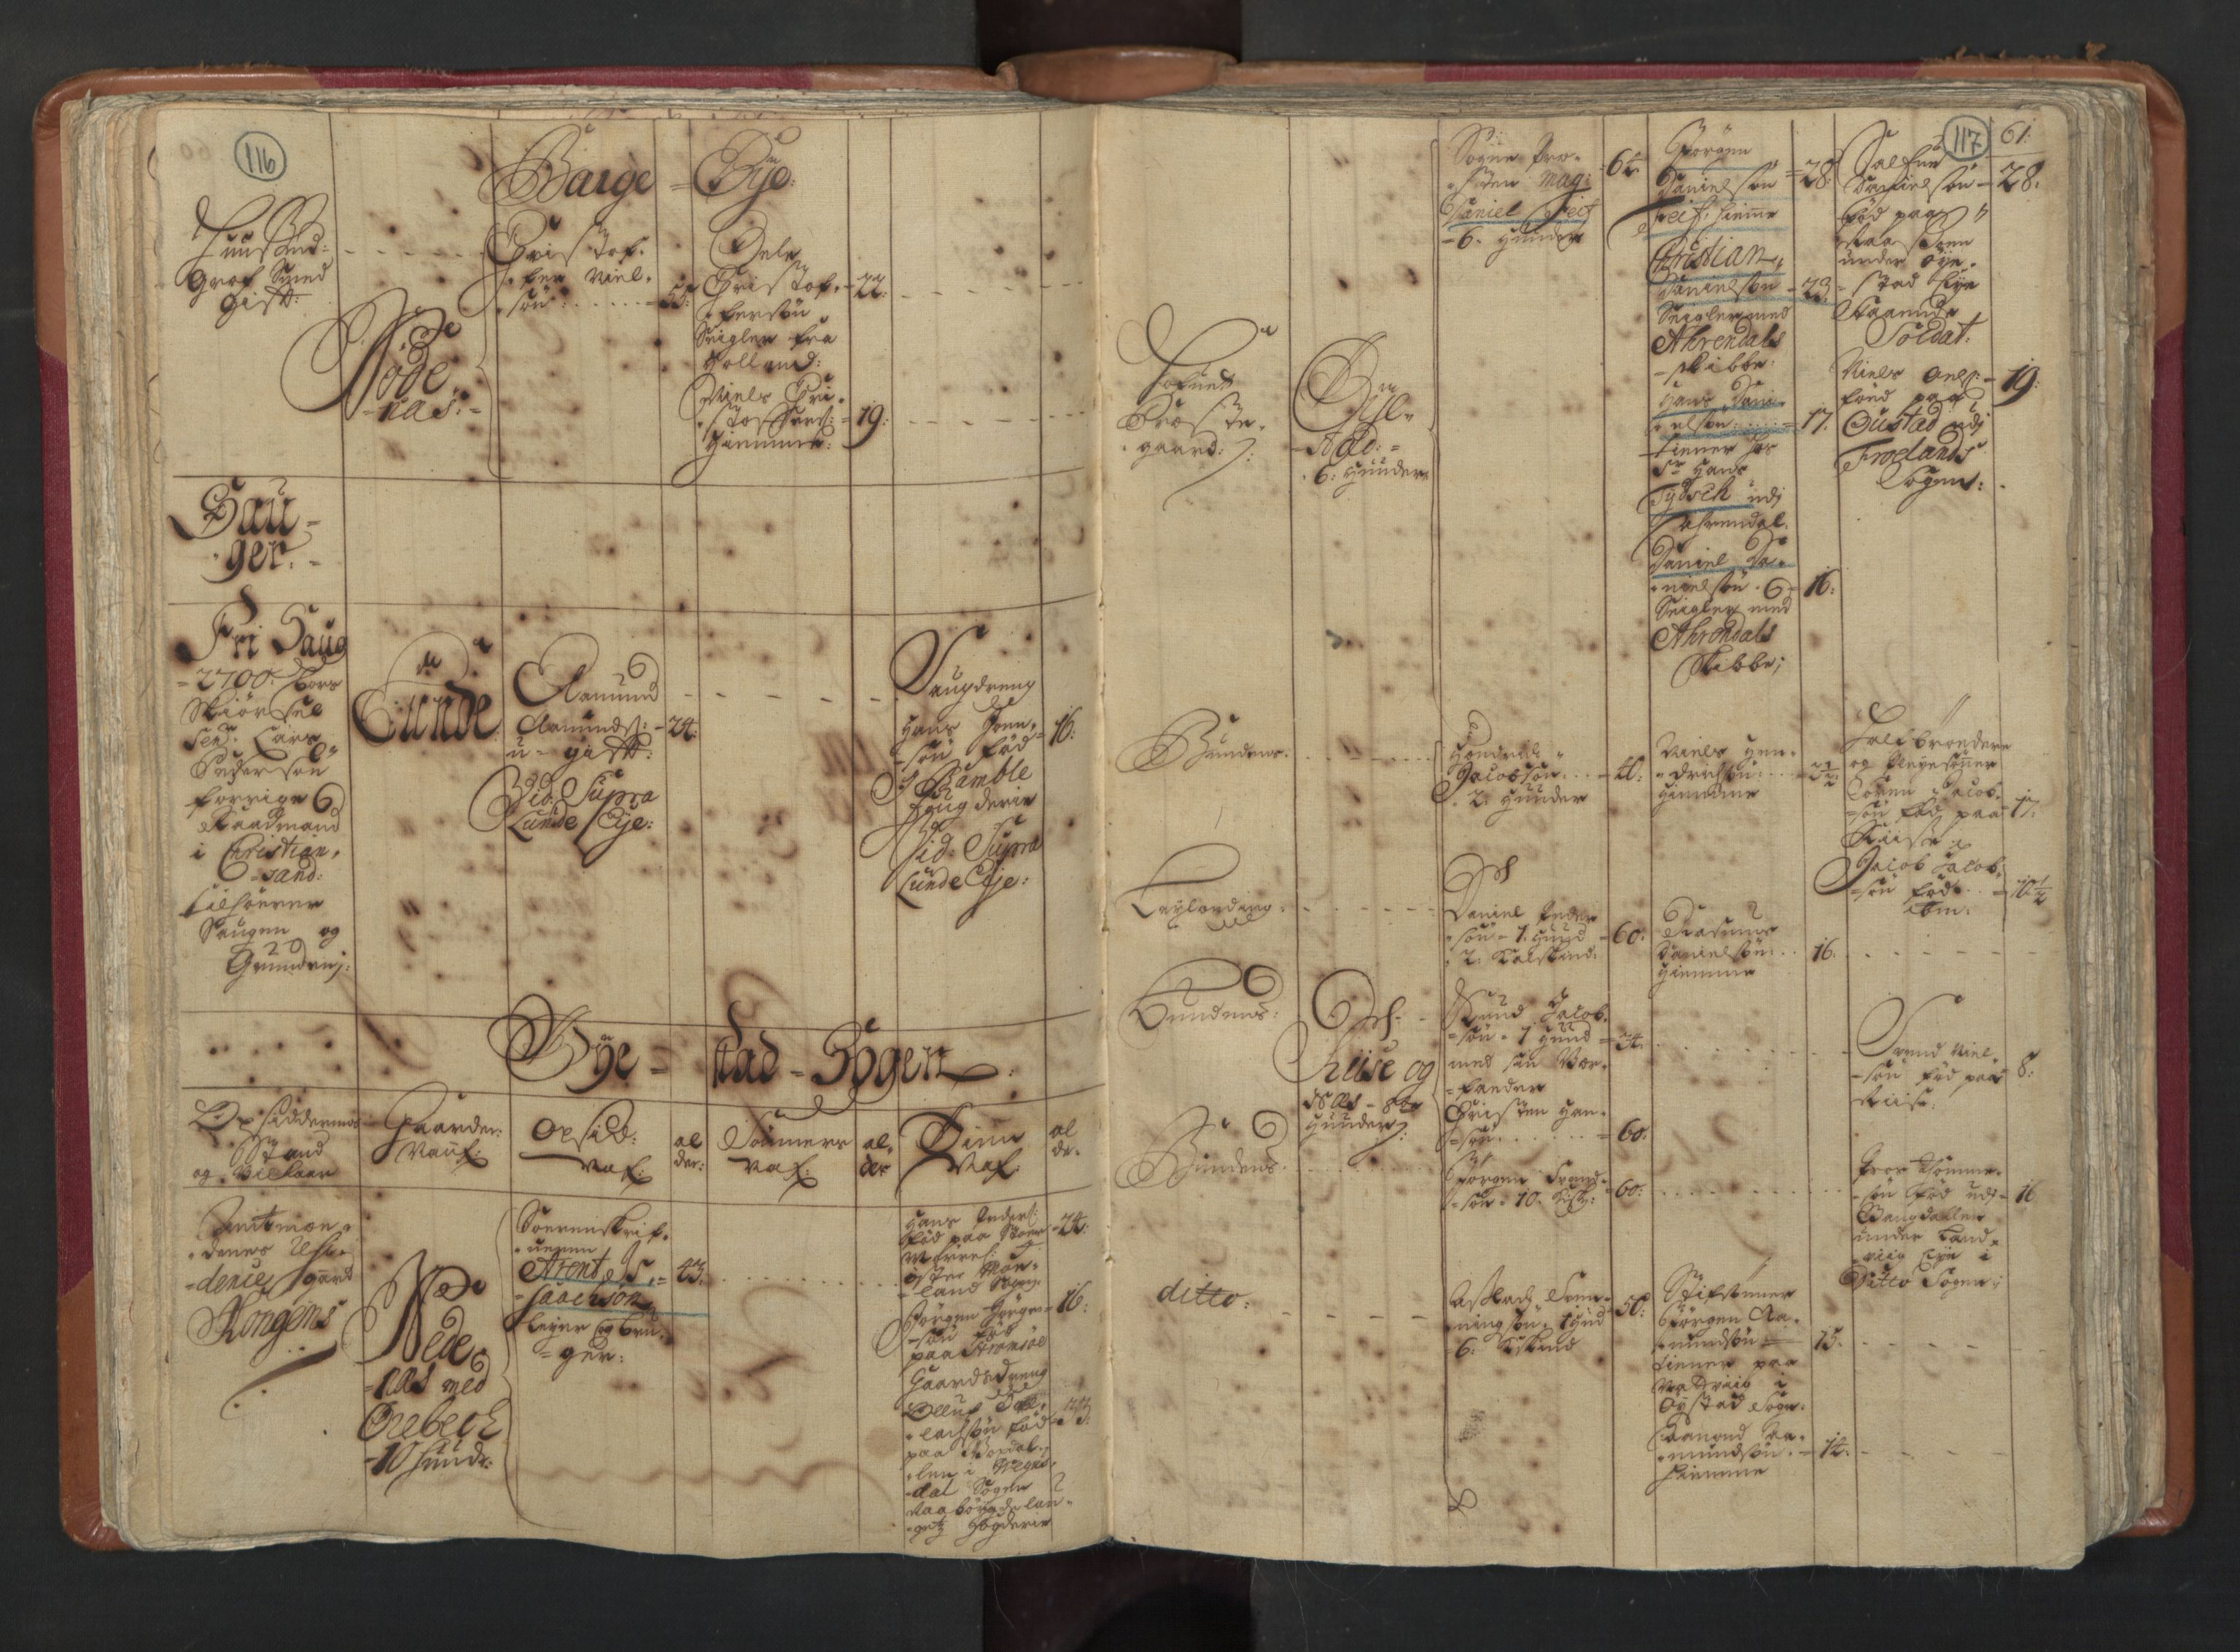 RA, Manntallet 1701, nr. 3: Nedenes fogderi, 1701, s. 116-117